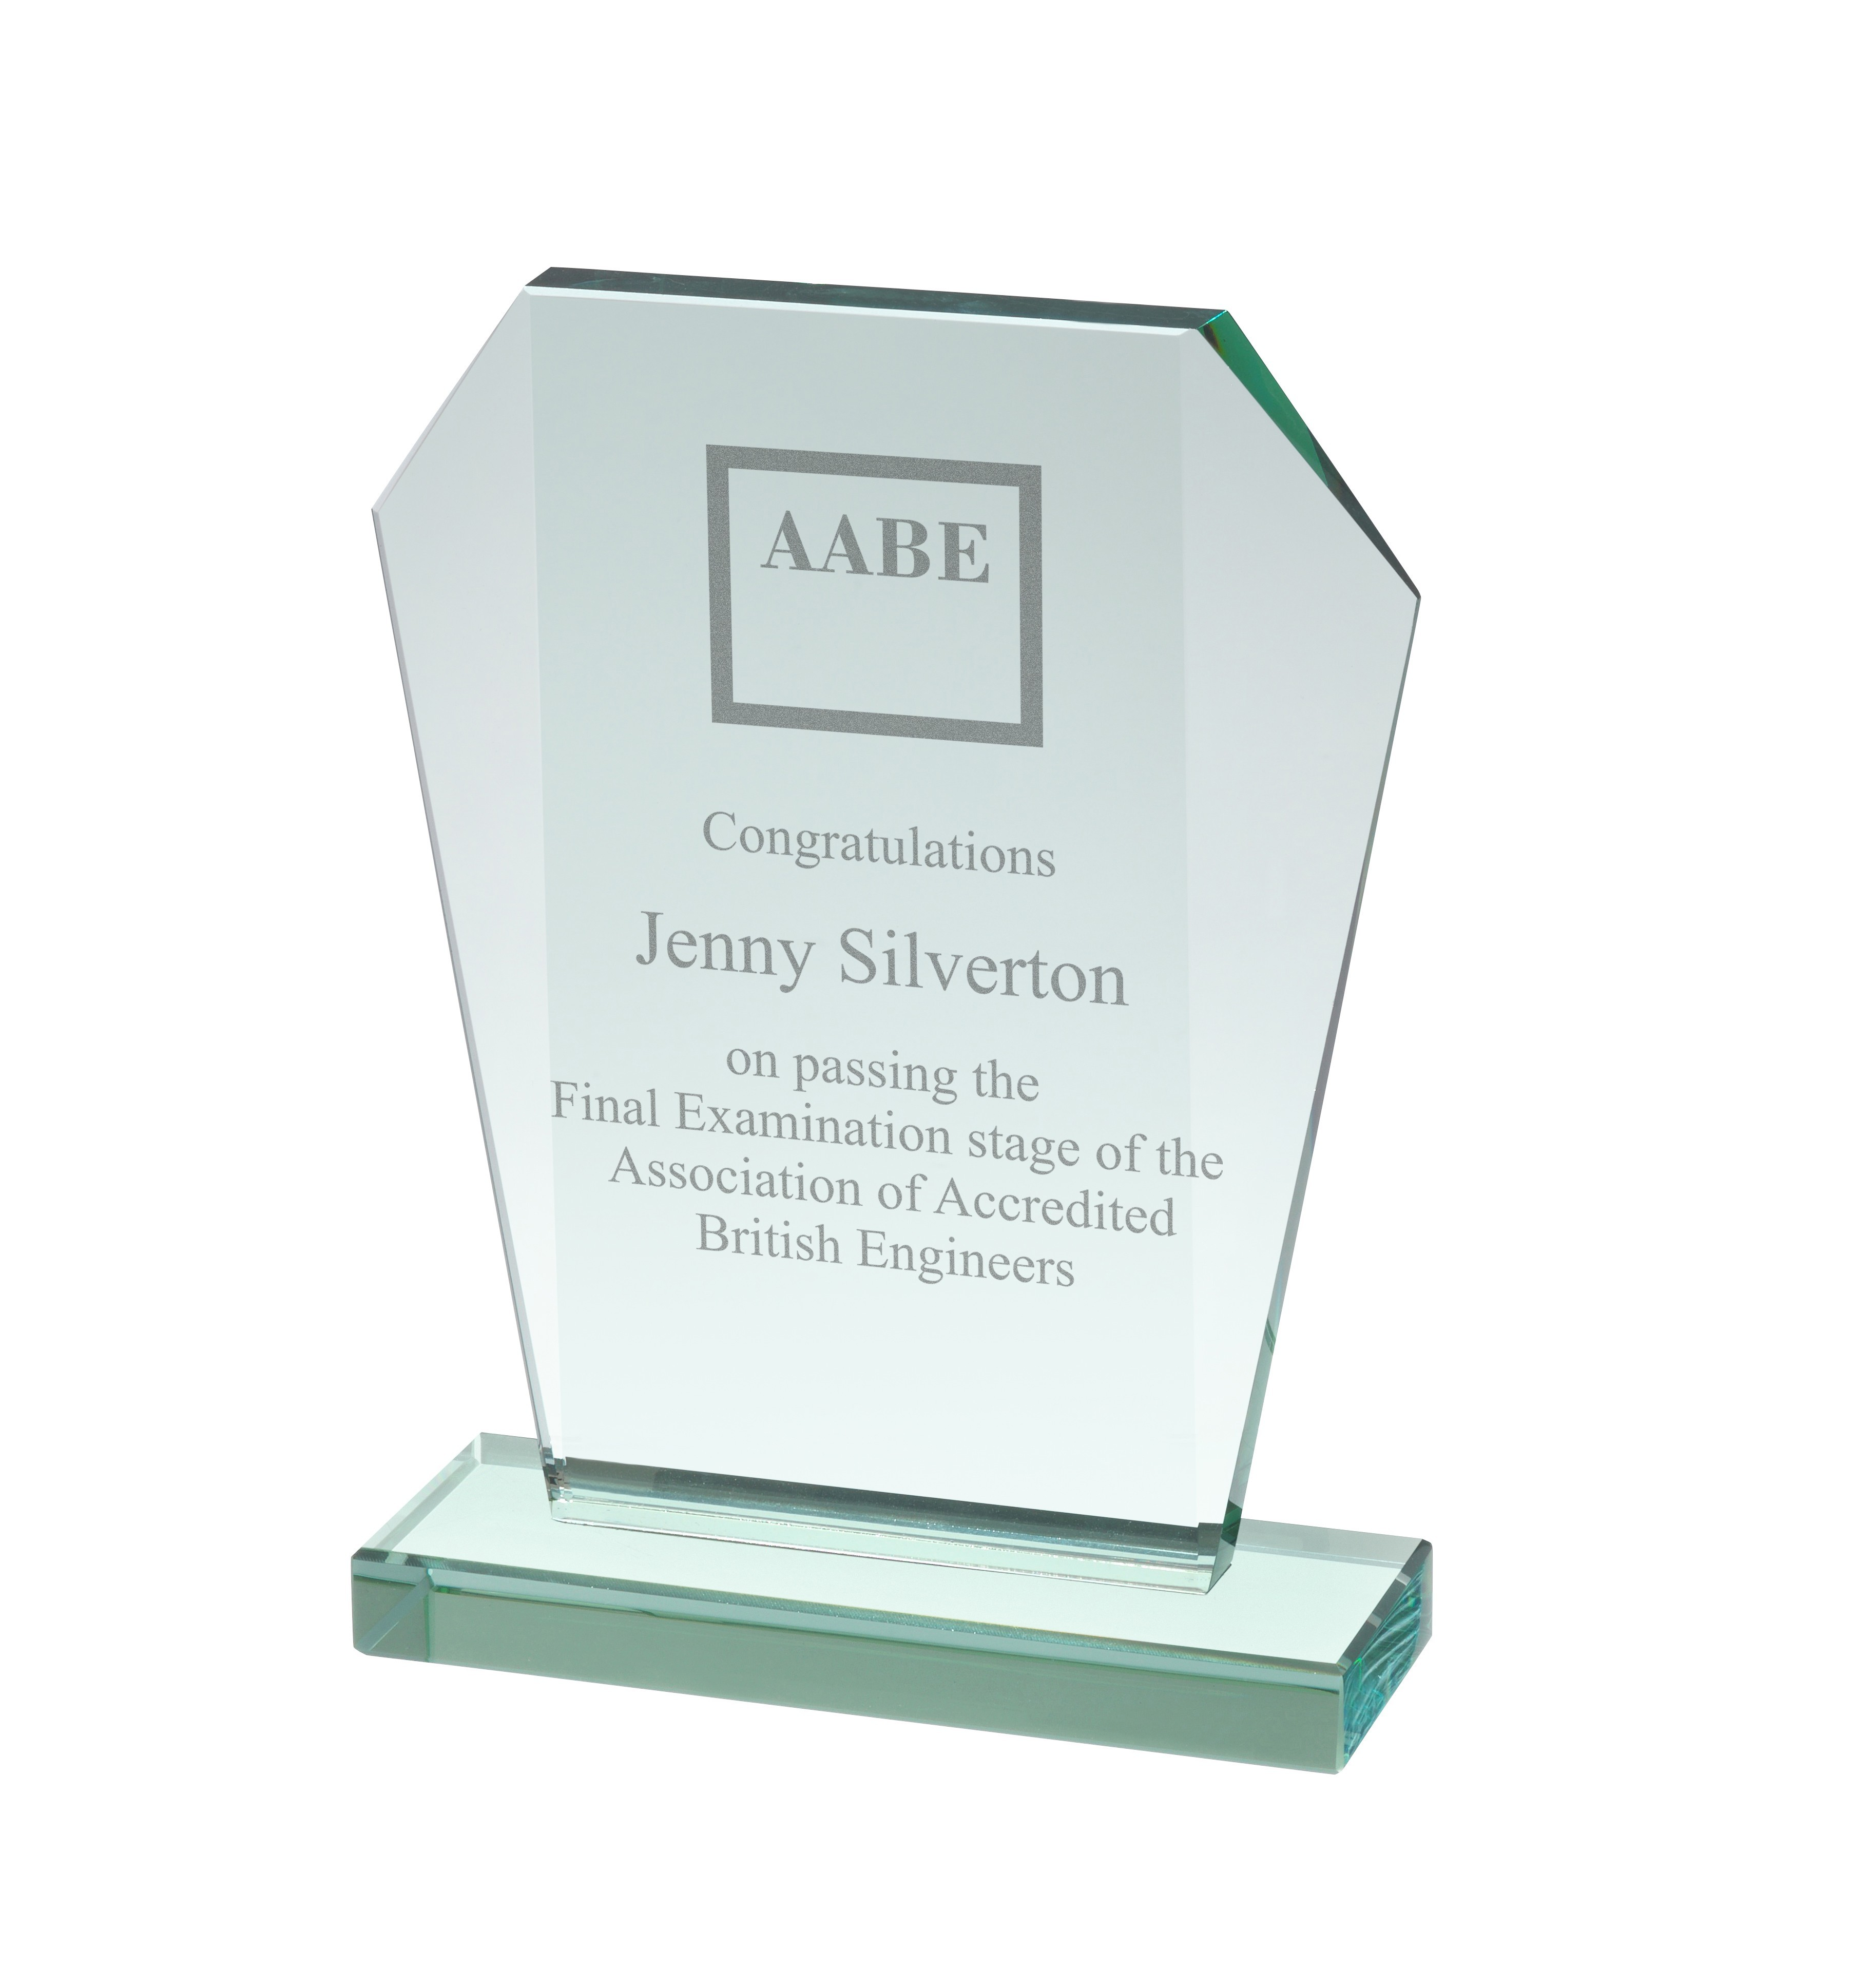 15mm Thick Jade Glass Wedge Award